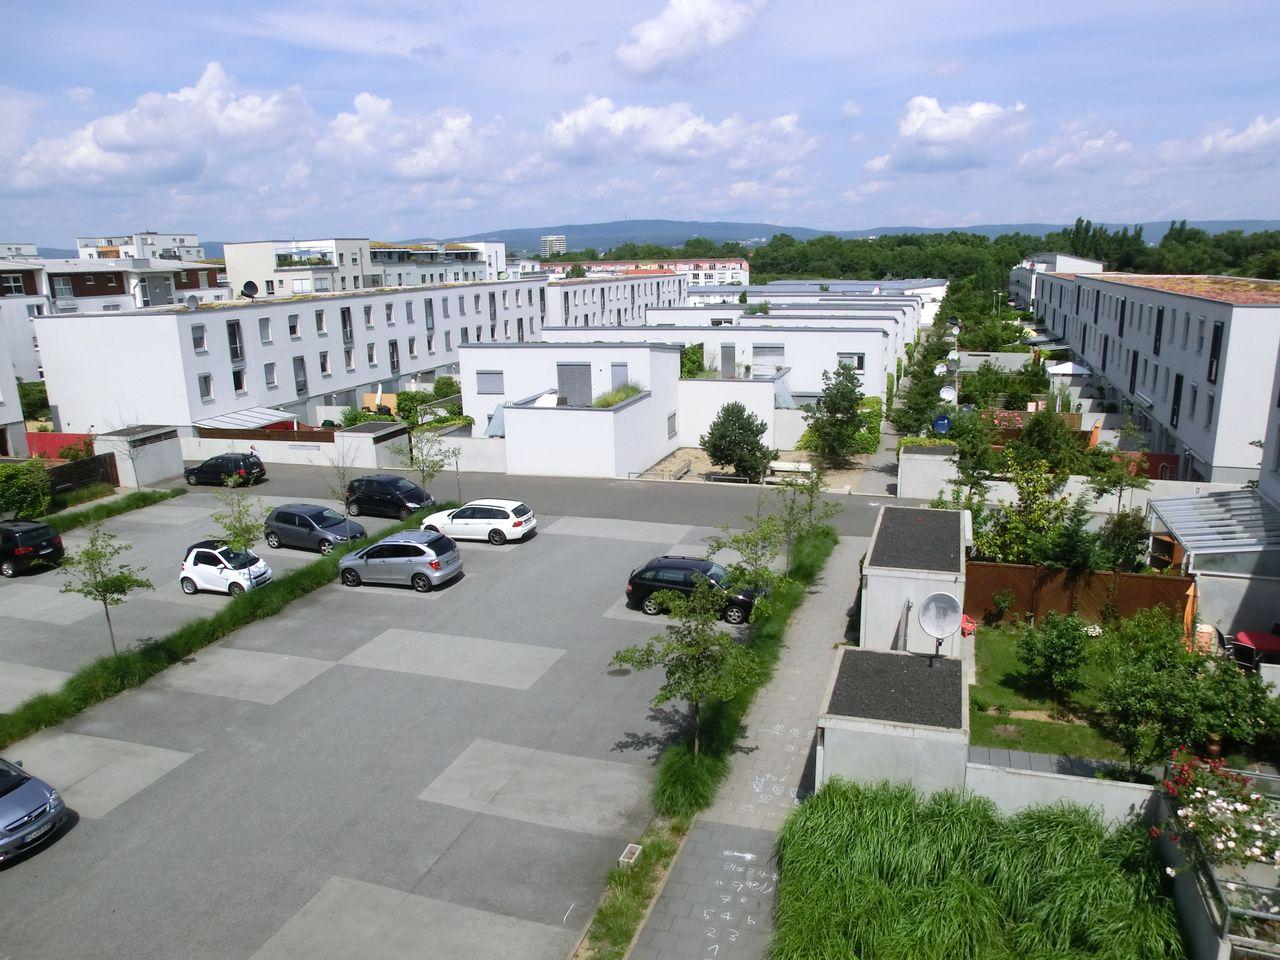 Pfarrer-Brantzen-Straße